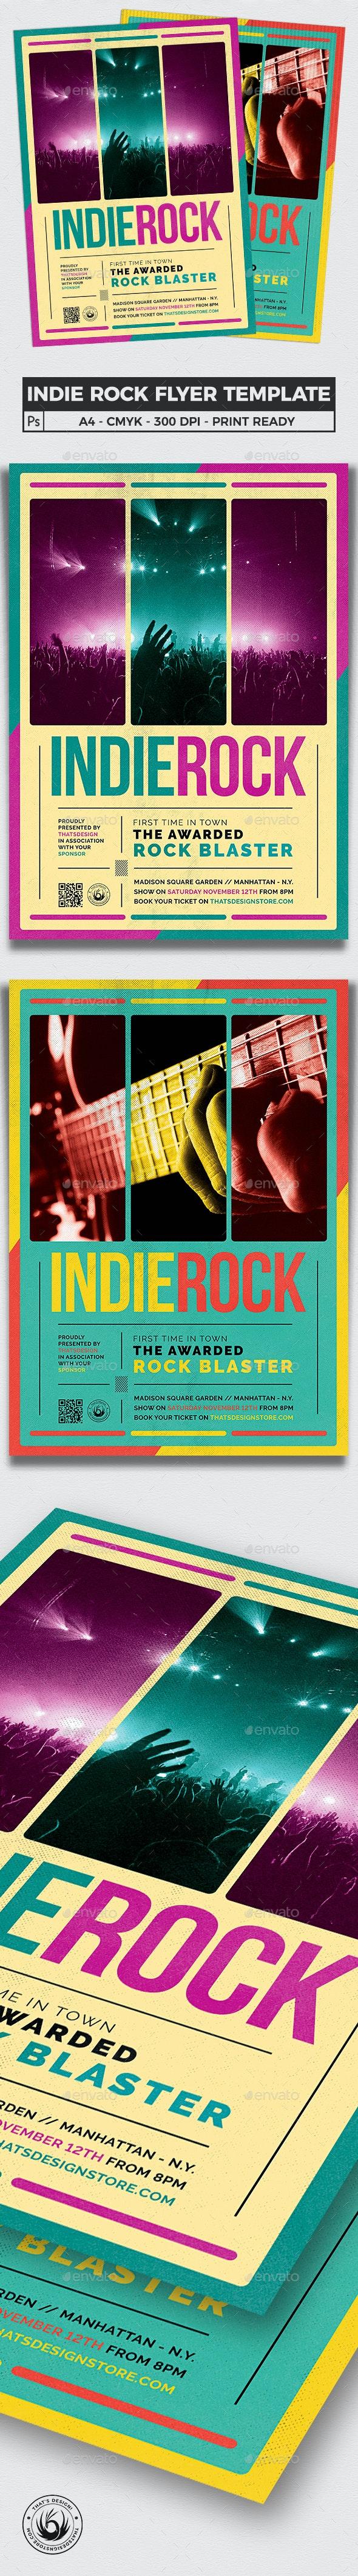 Indie Rock Flyer Template V2 - Concerts Events